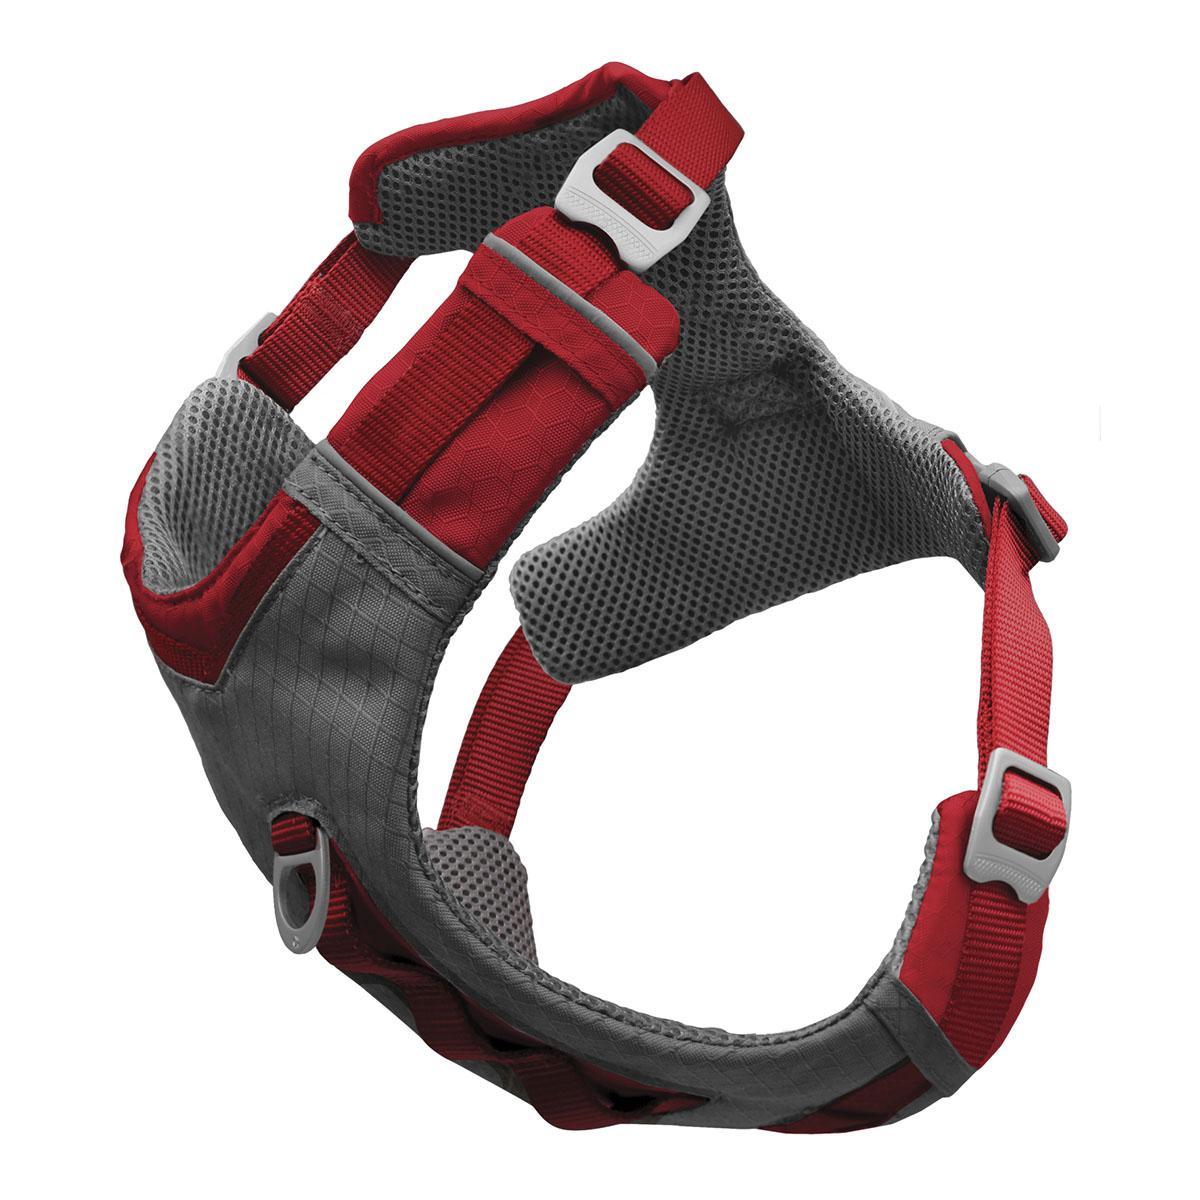 Kurgo Journey Air Dog Harness - Red